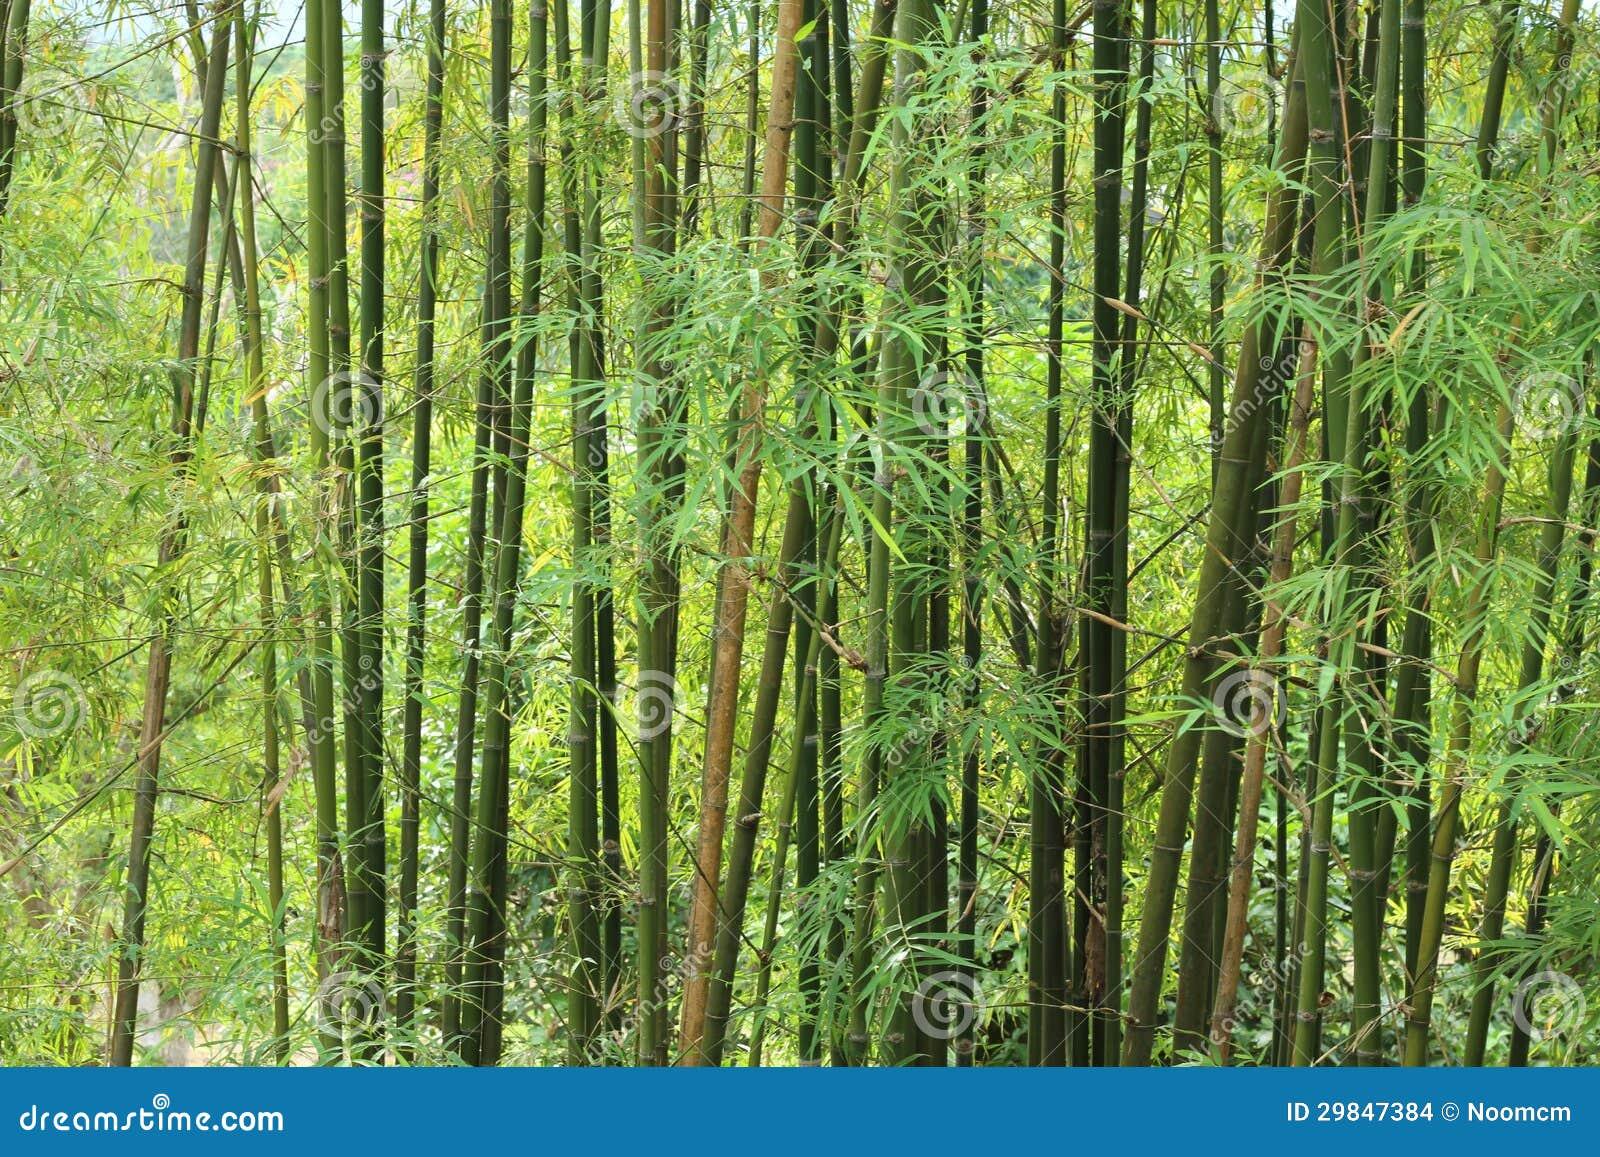 Fundo de árvores de bambu verdes